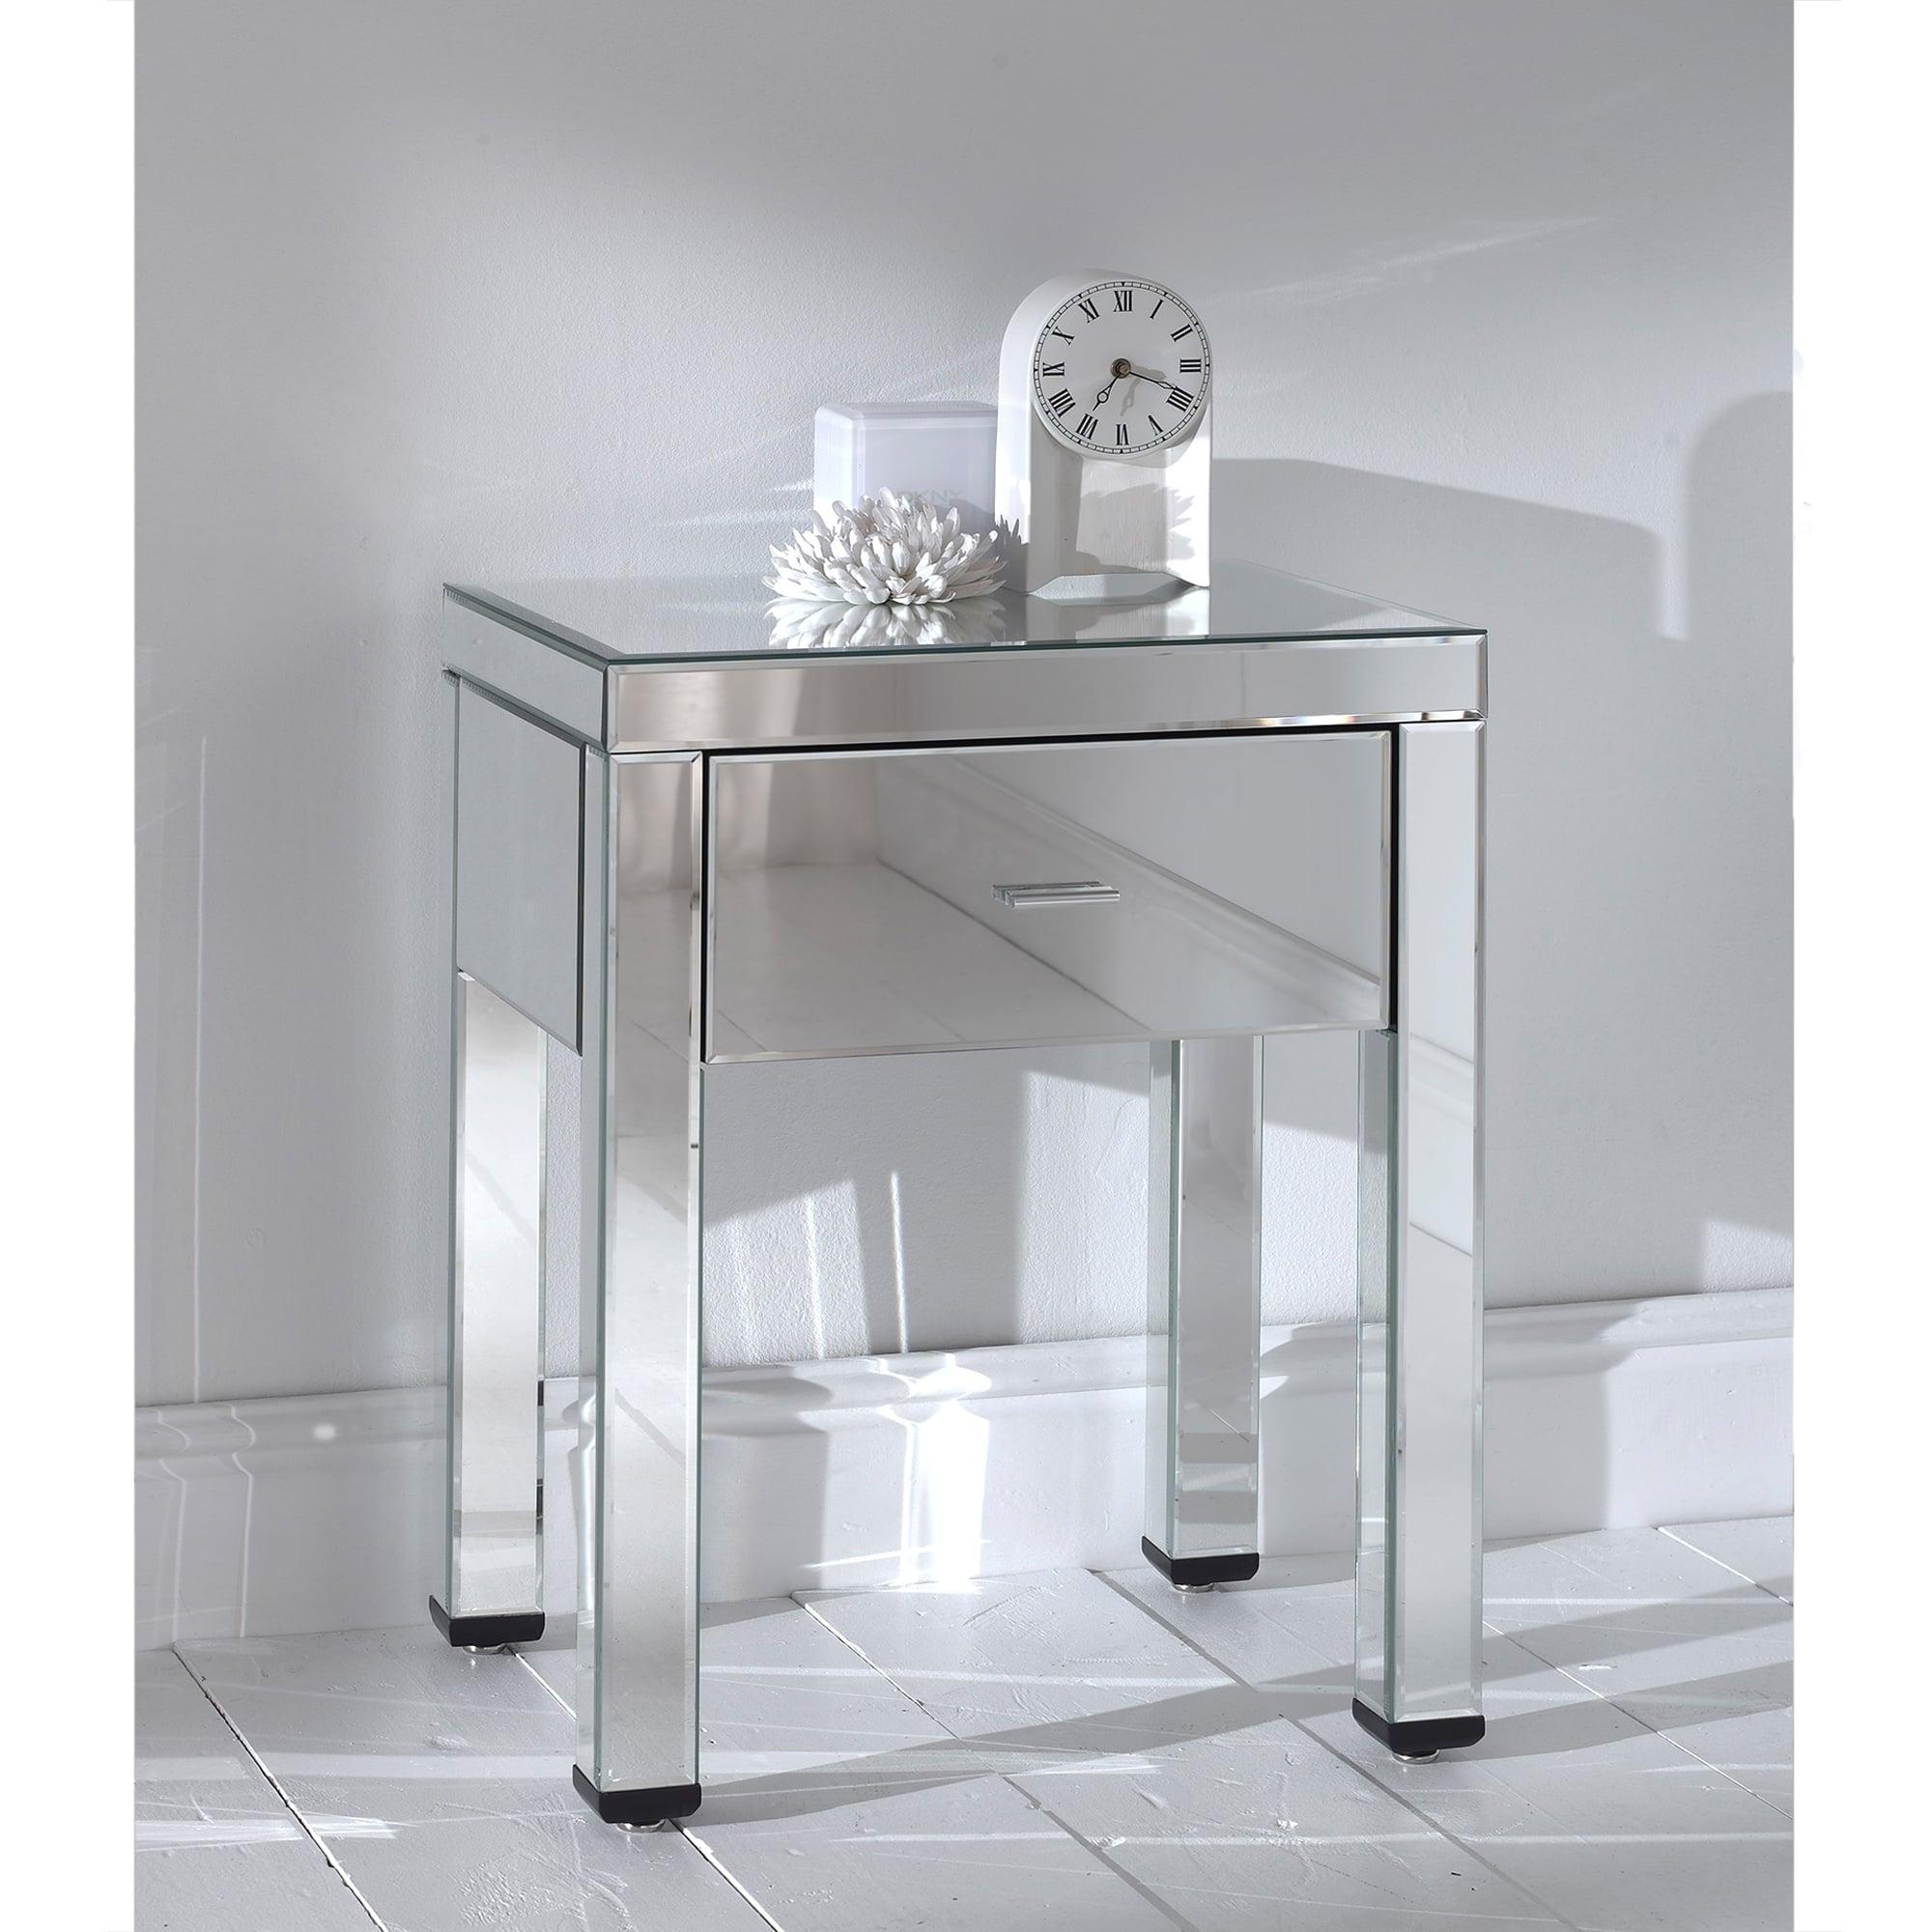 Venetian Romano Mirrored Side Table, Narrow Mirrored Side Table